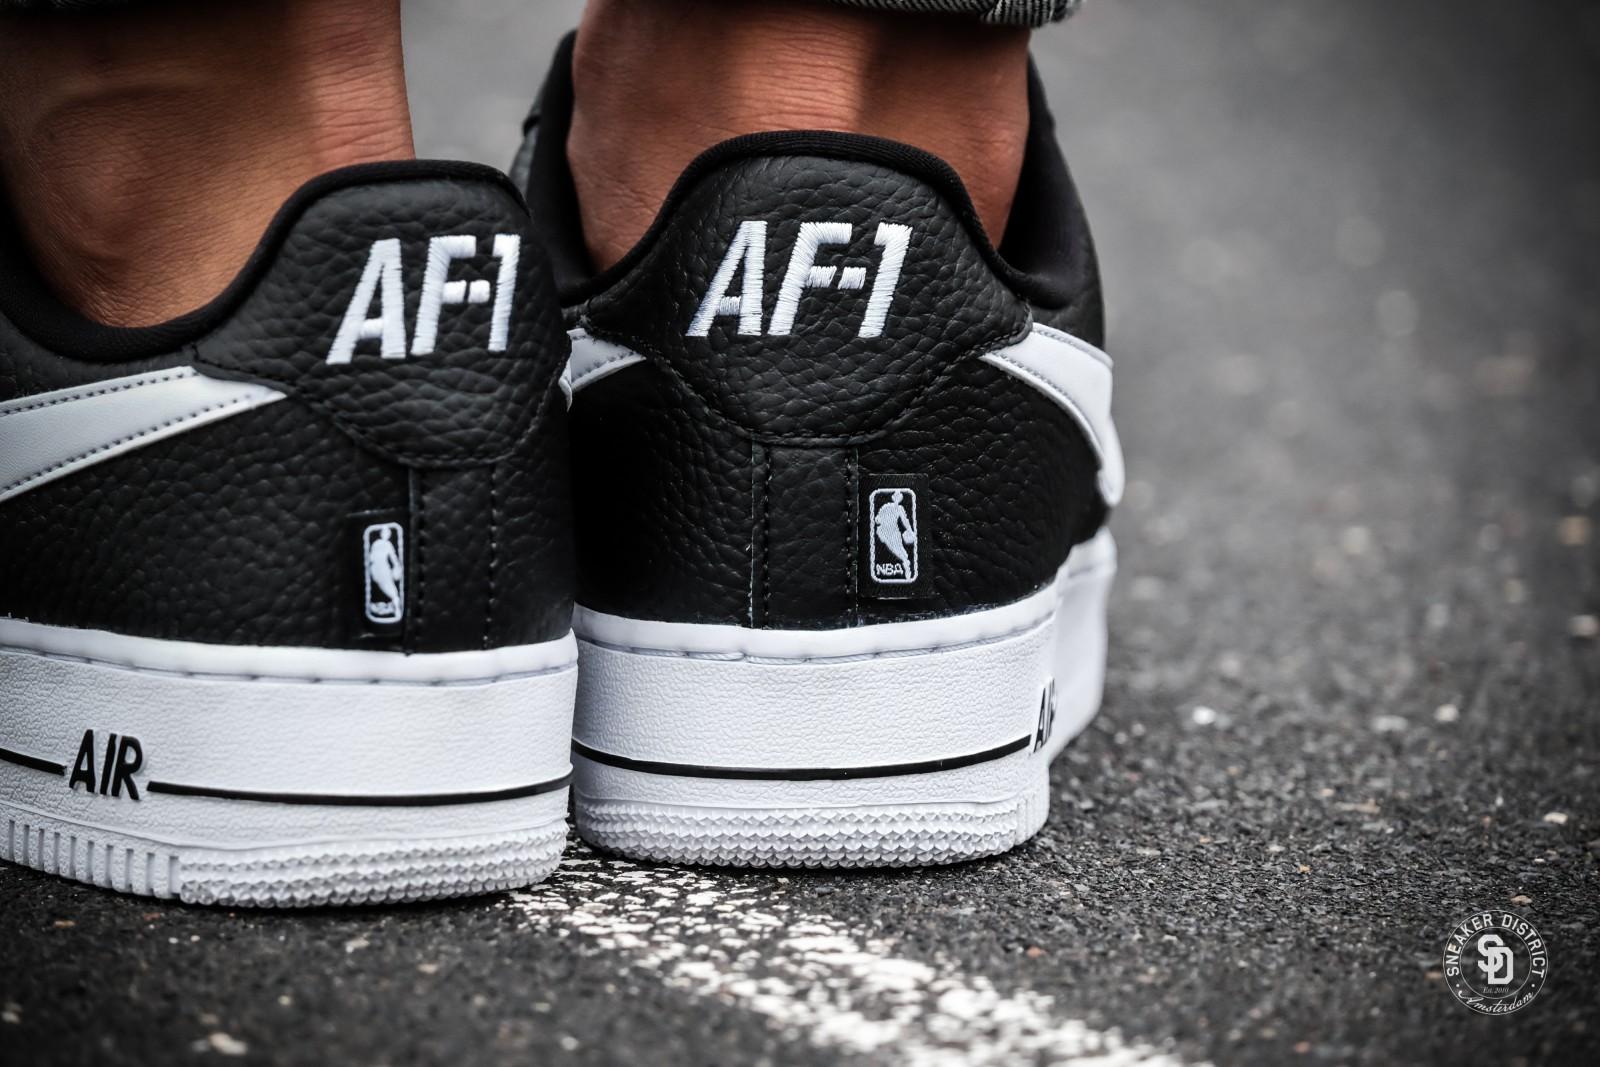 nike air force 1 07 lv8 nba pack blackwhite sneakers